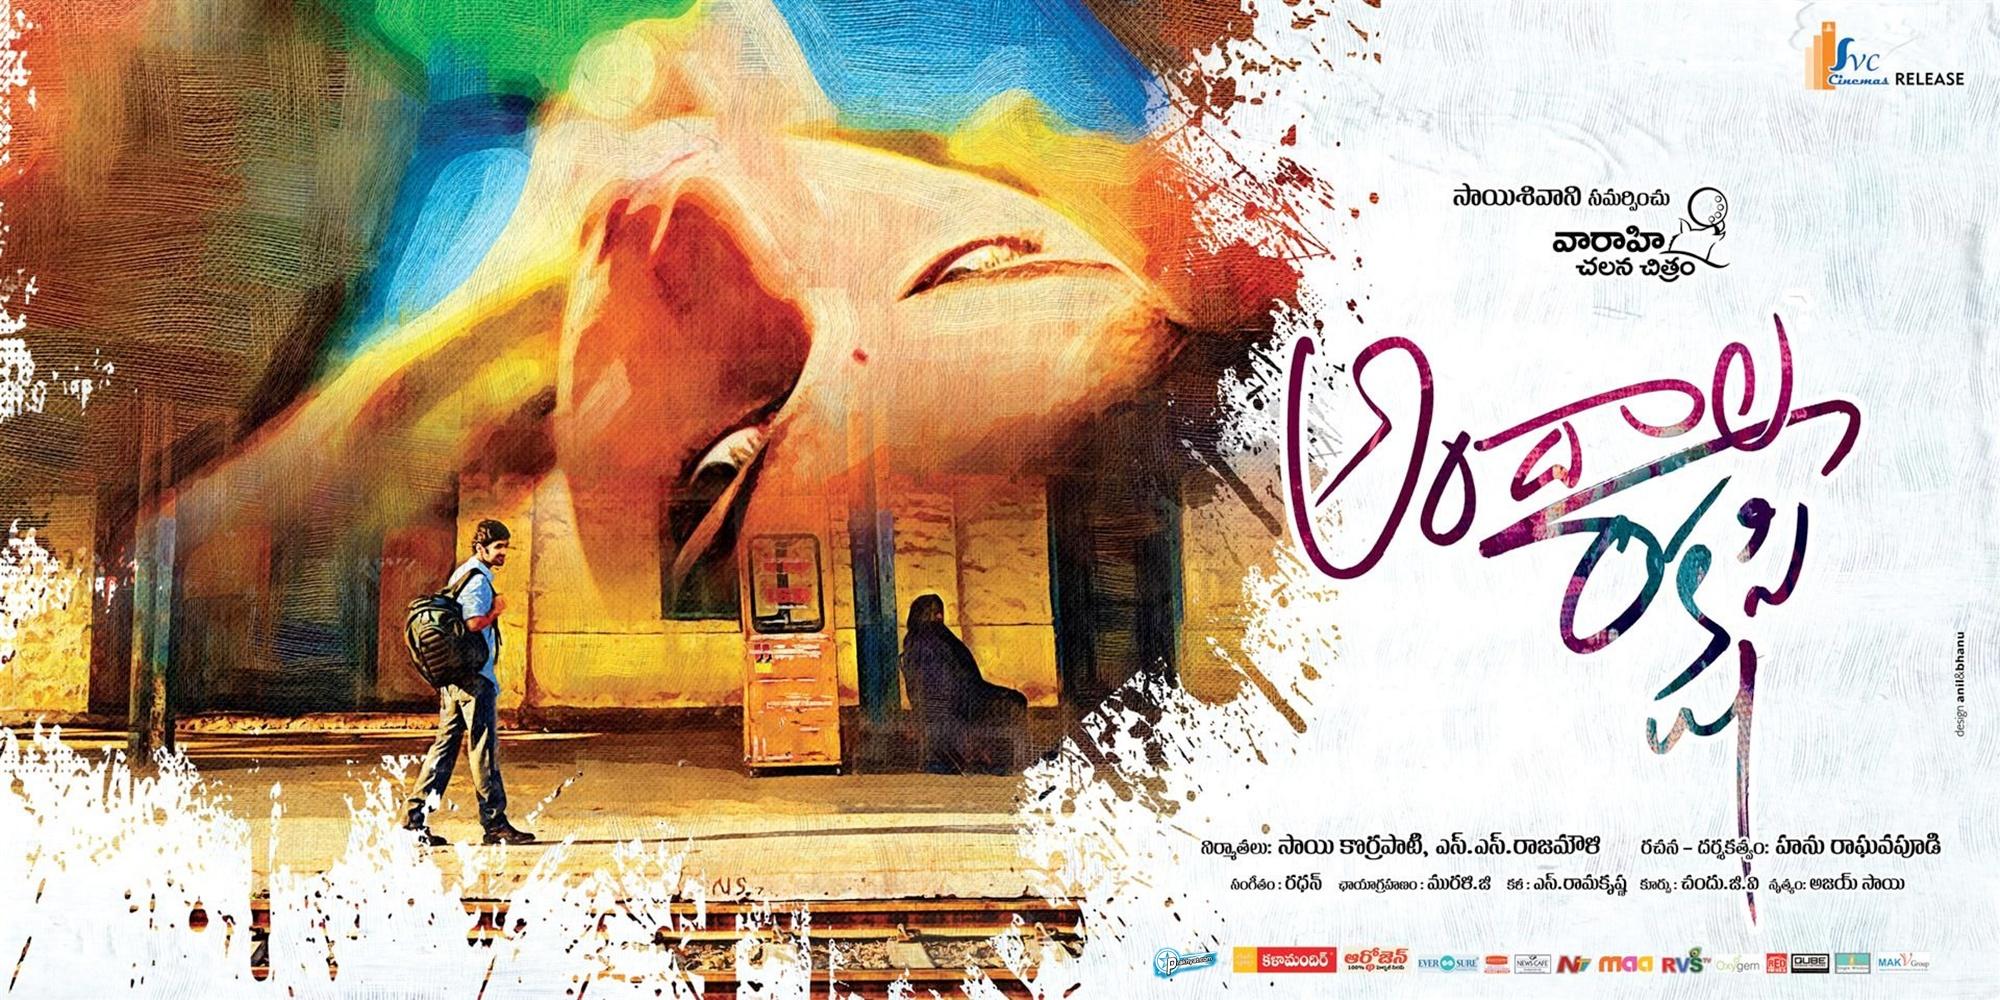 Nara Rohit Balakrishnudu Movie First Look Ultra Hd Posters: Prince Downloads: Andala Rakshashi Movie Latest Posters